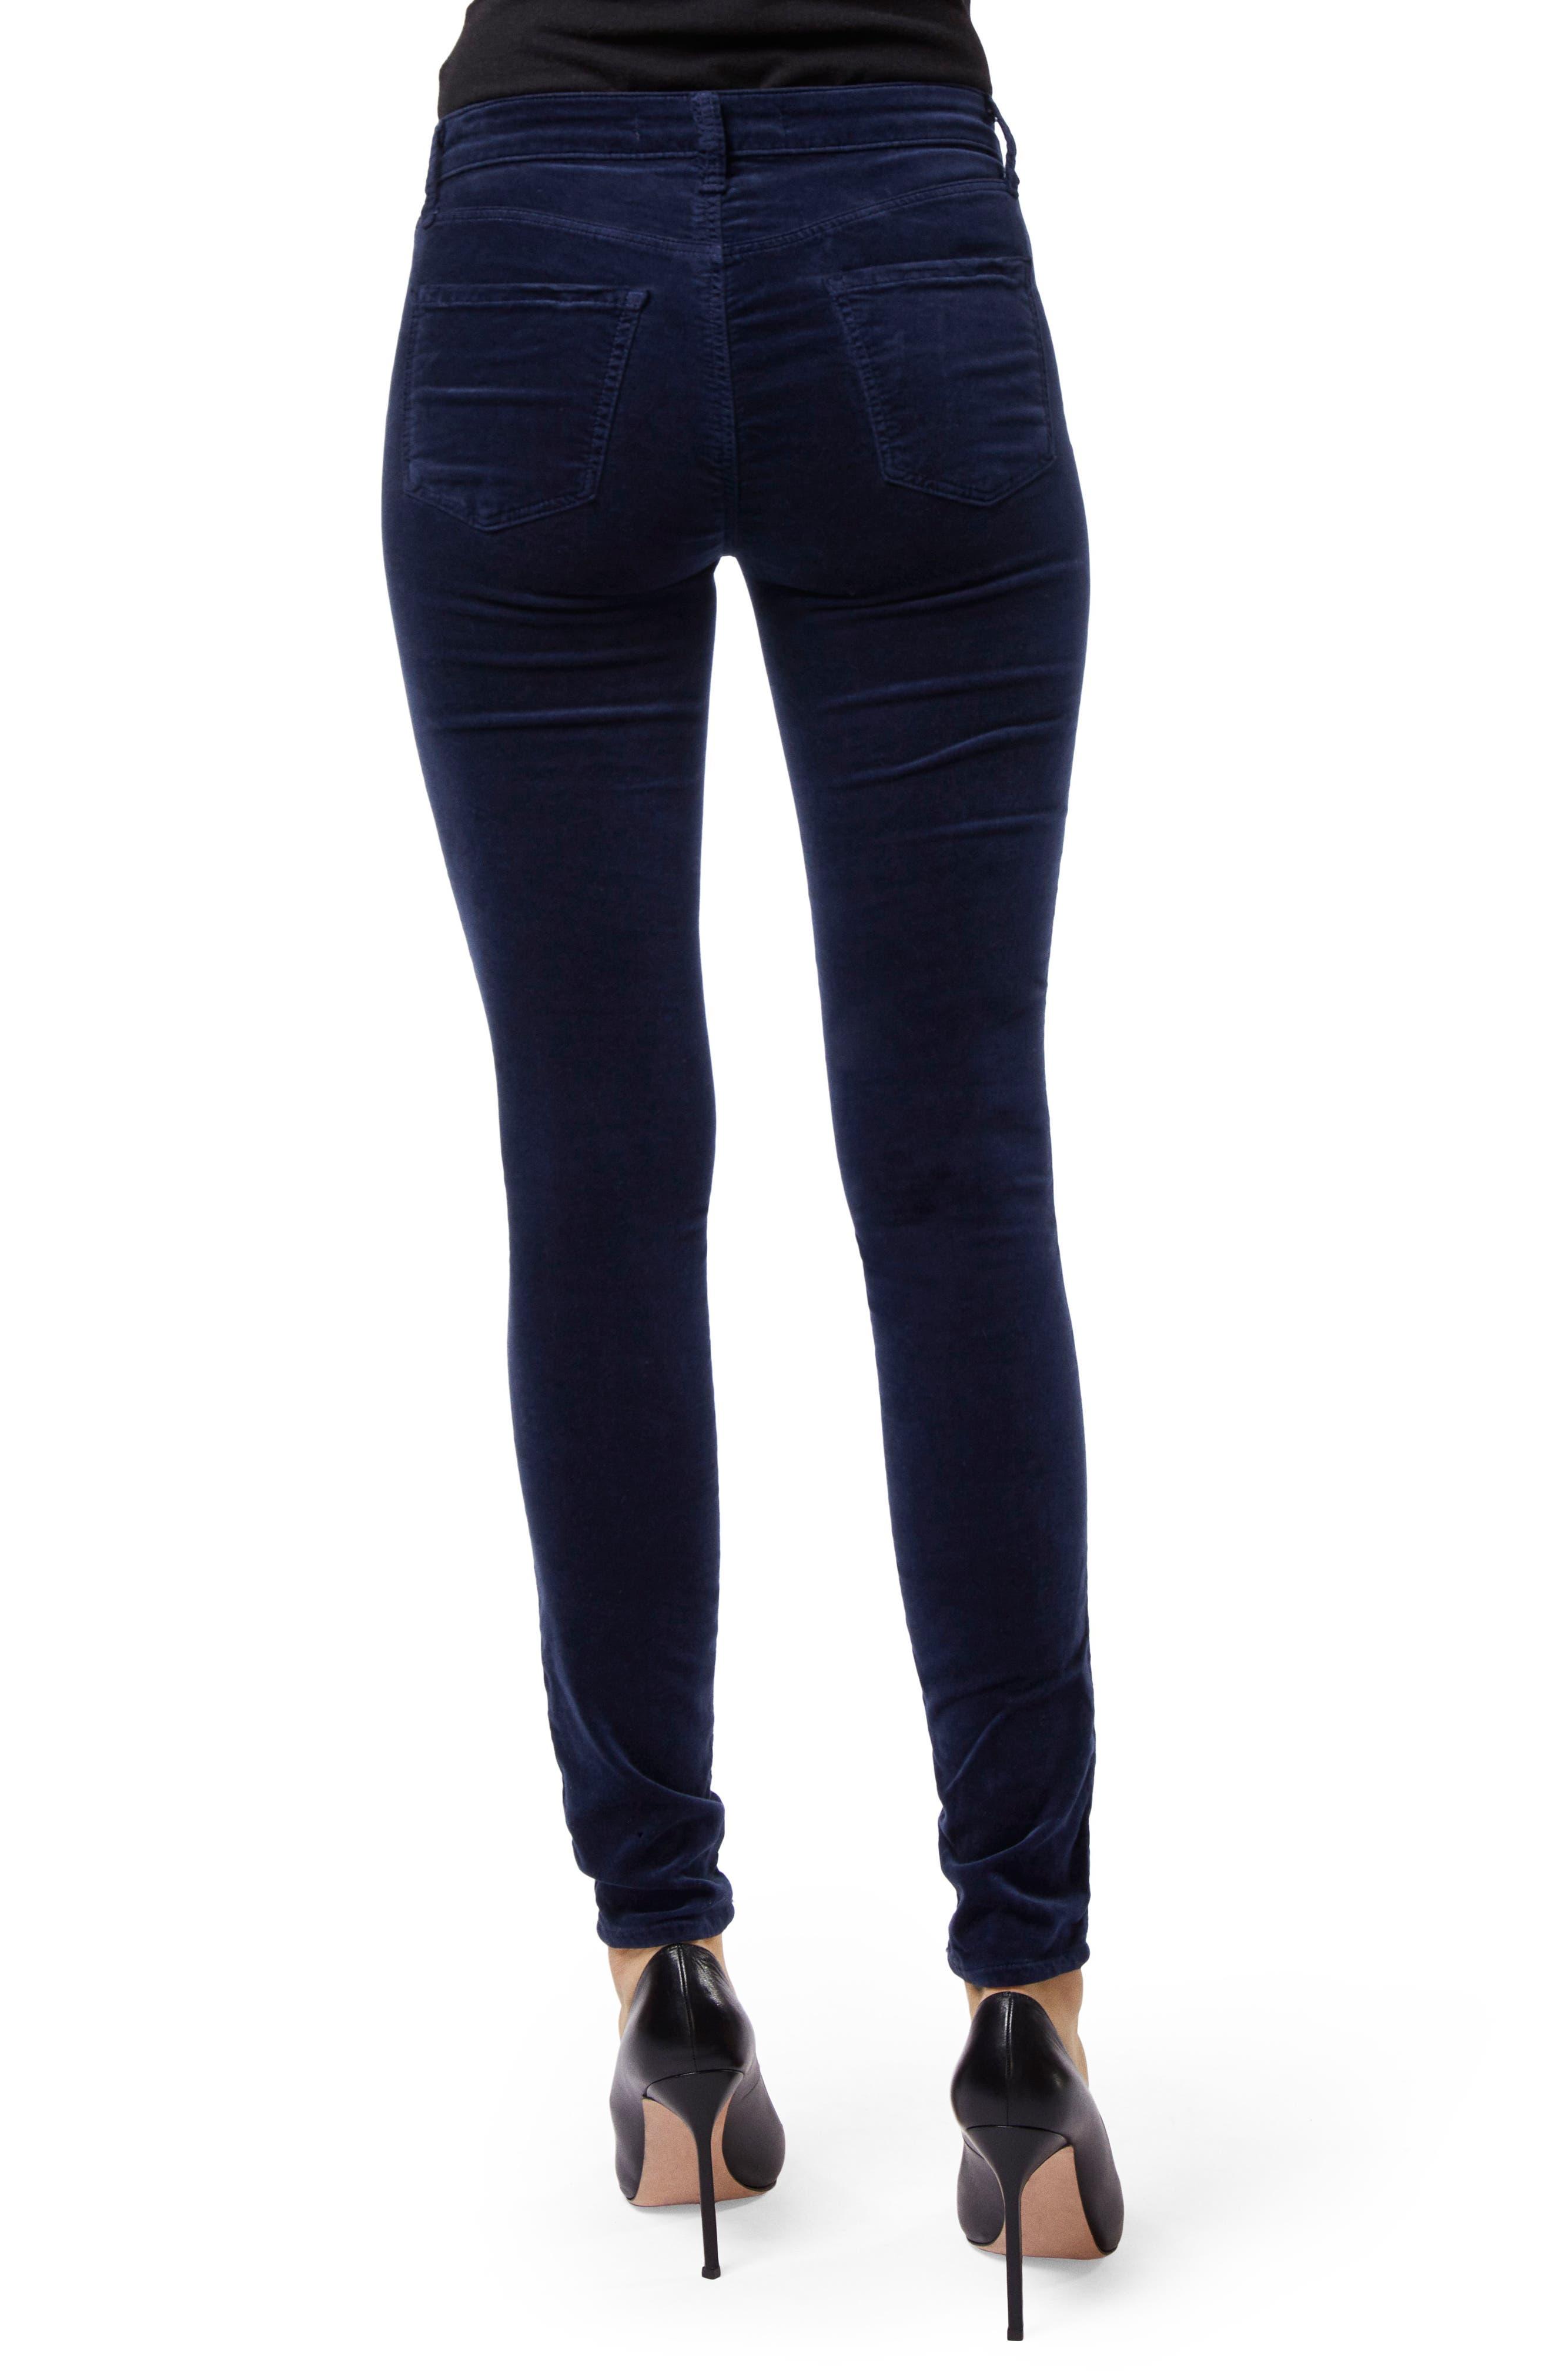 Maria High Waist Velvet Skinny Jeans,                             Alternate thumbnail 2, color,                             NIGHT OUT